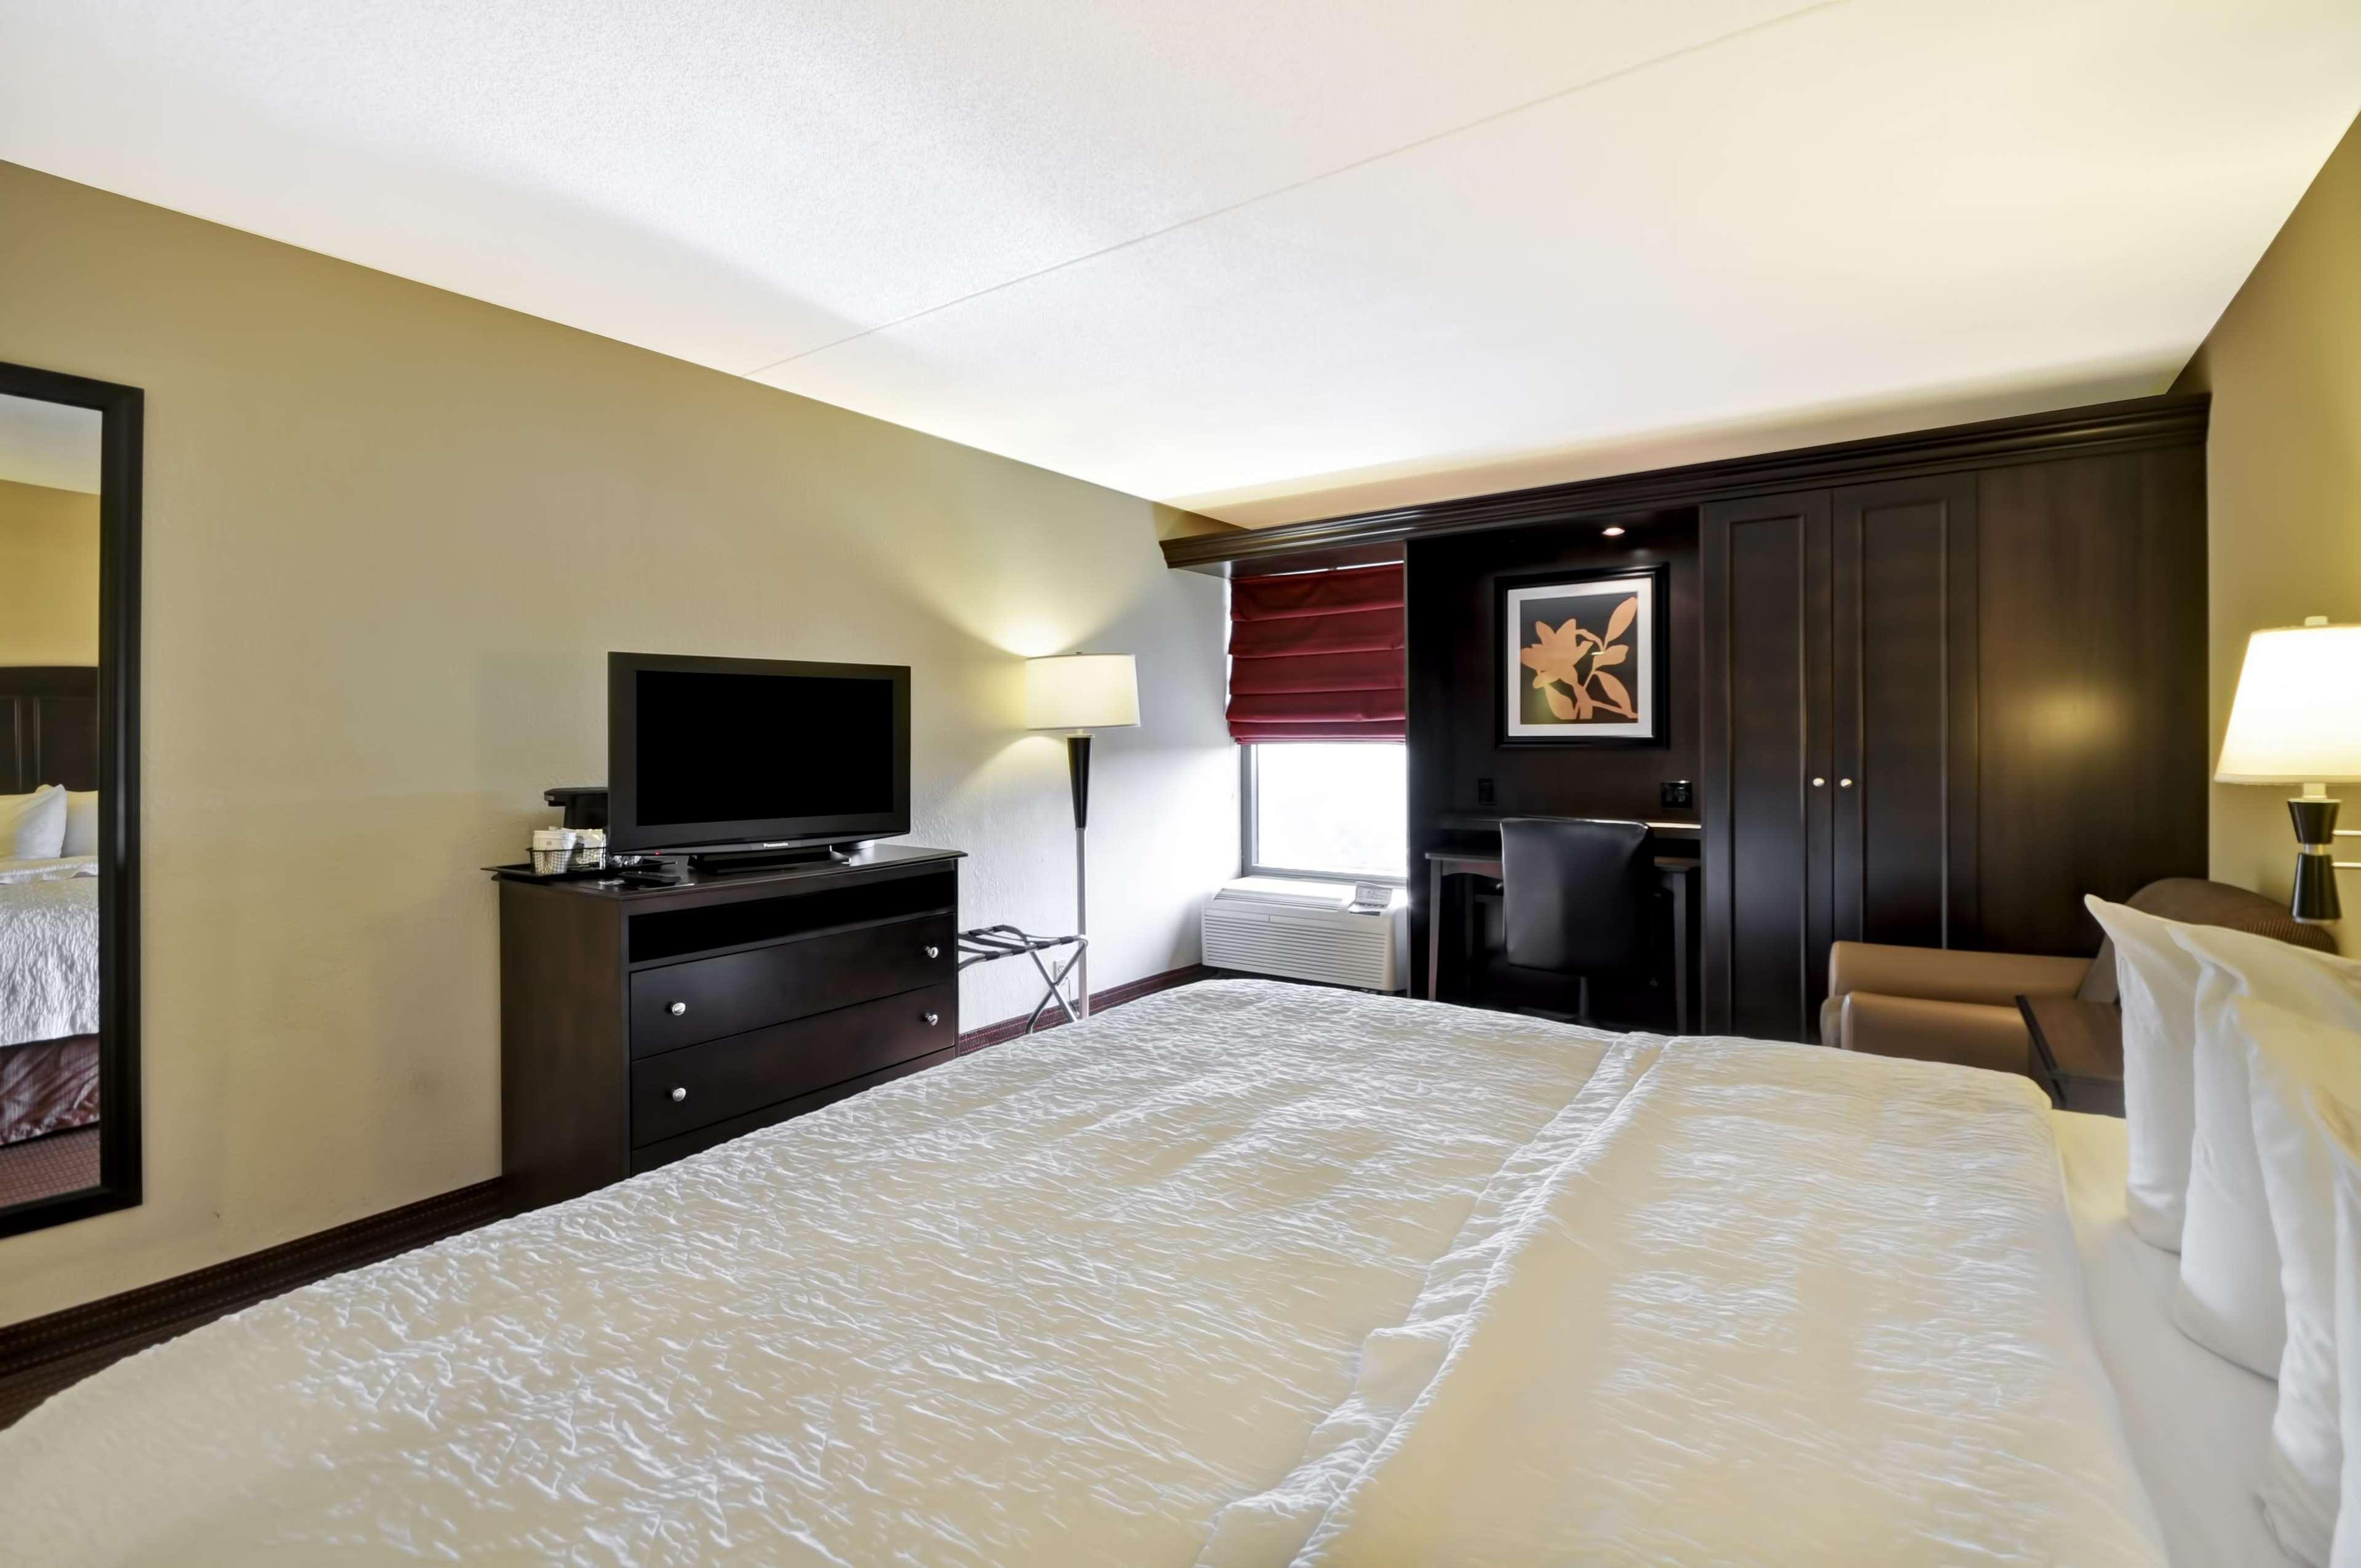 Hampton Inn Kansas City/Overland Park image 40